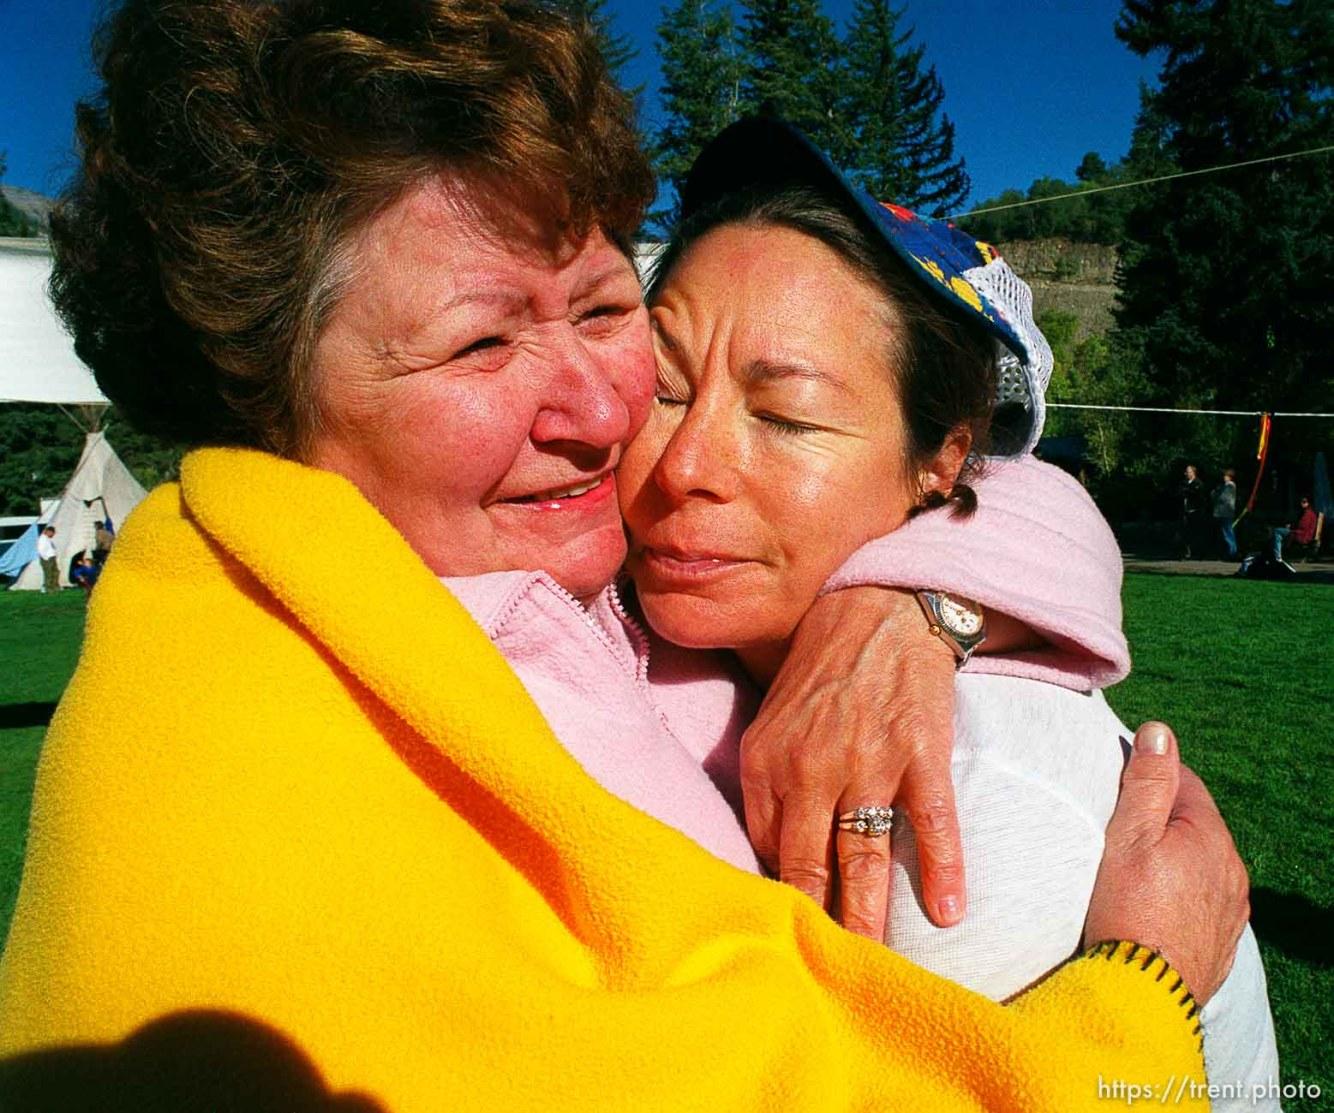 BarDonna Zollinger embraces her daughter, runner Ruth Zollinger, at the end of the race, Sundance Ski Resort. Wasatch 100 Endurance Run.